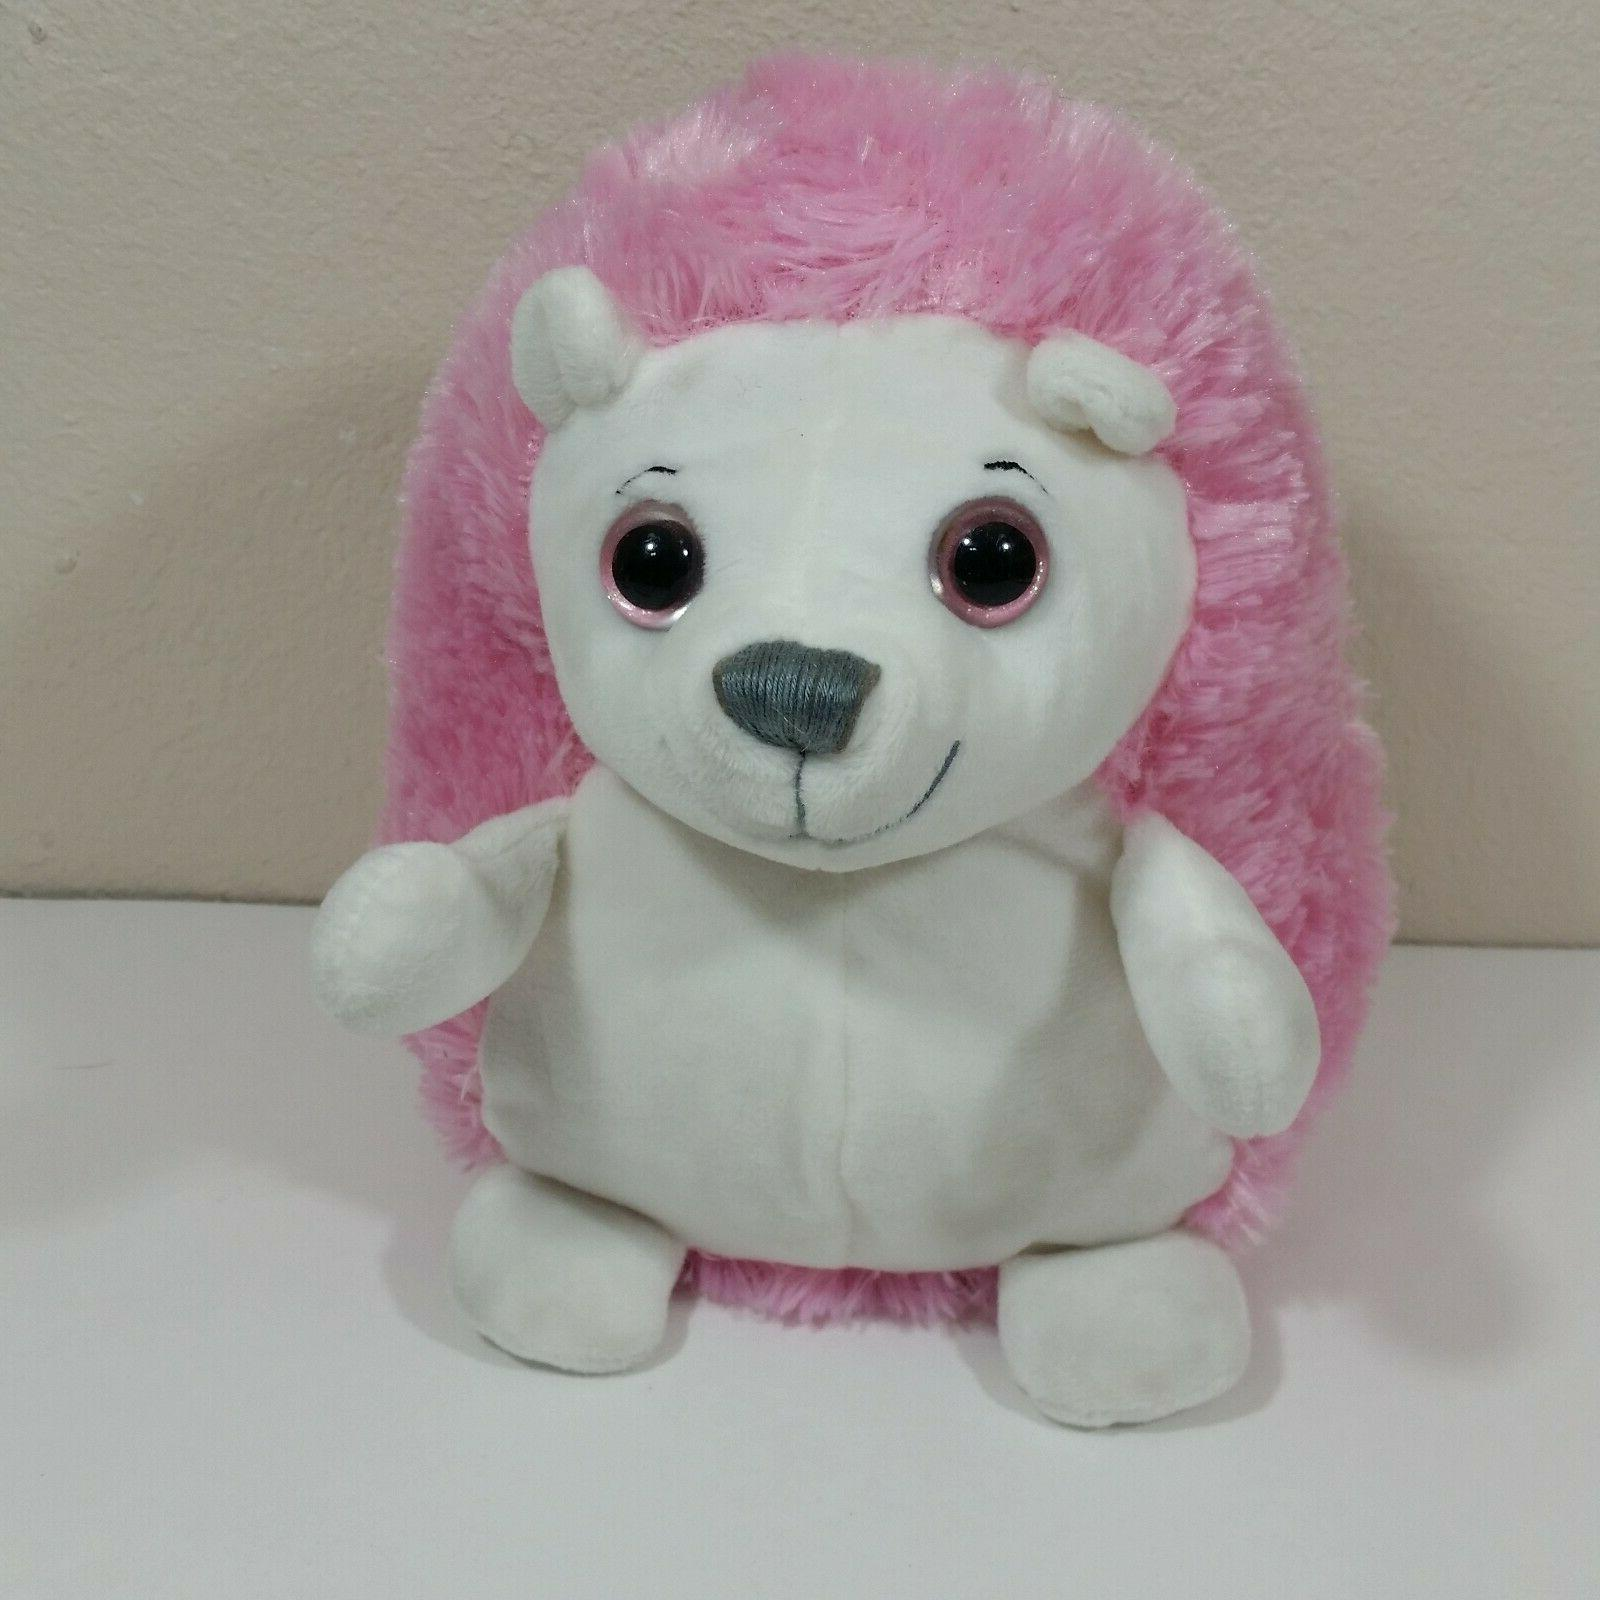 demdaco hedgehog 8 inch plush pink white